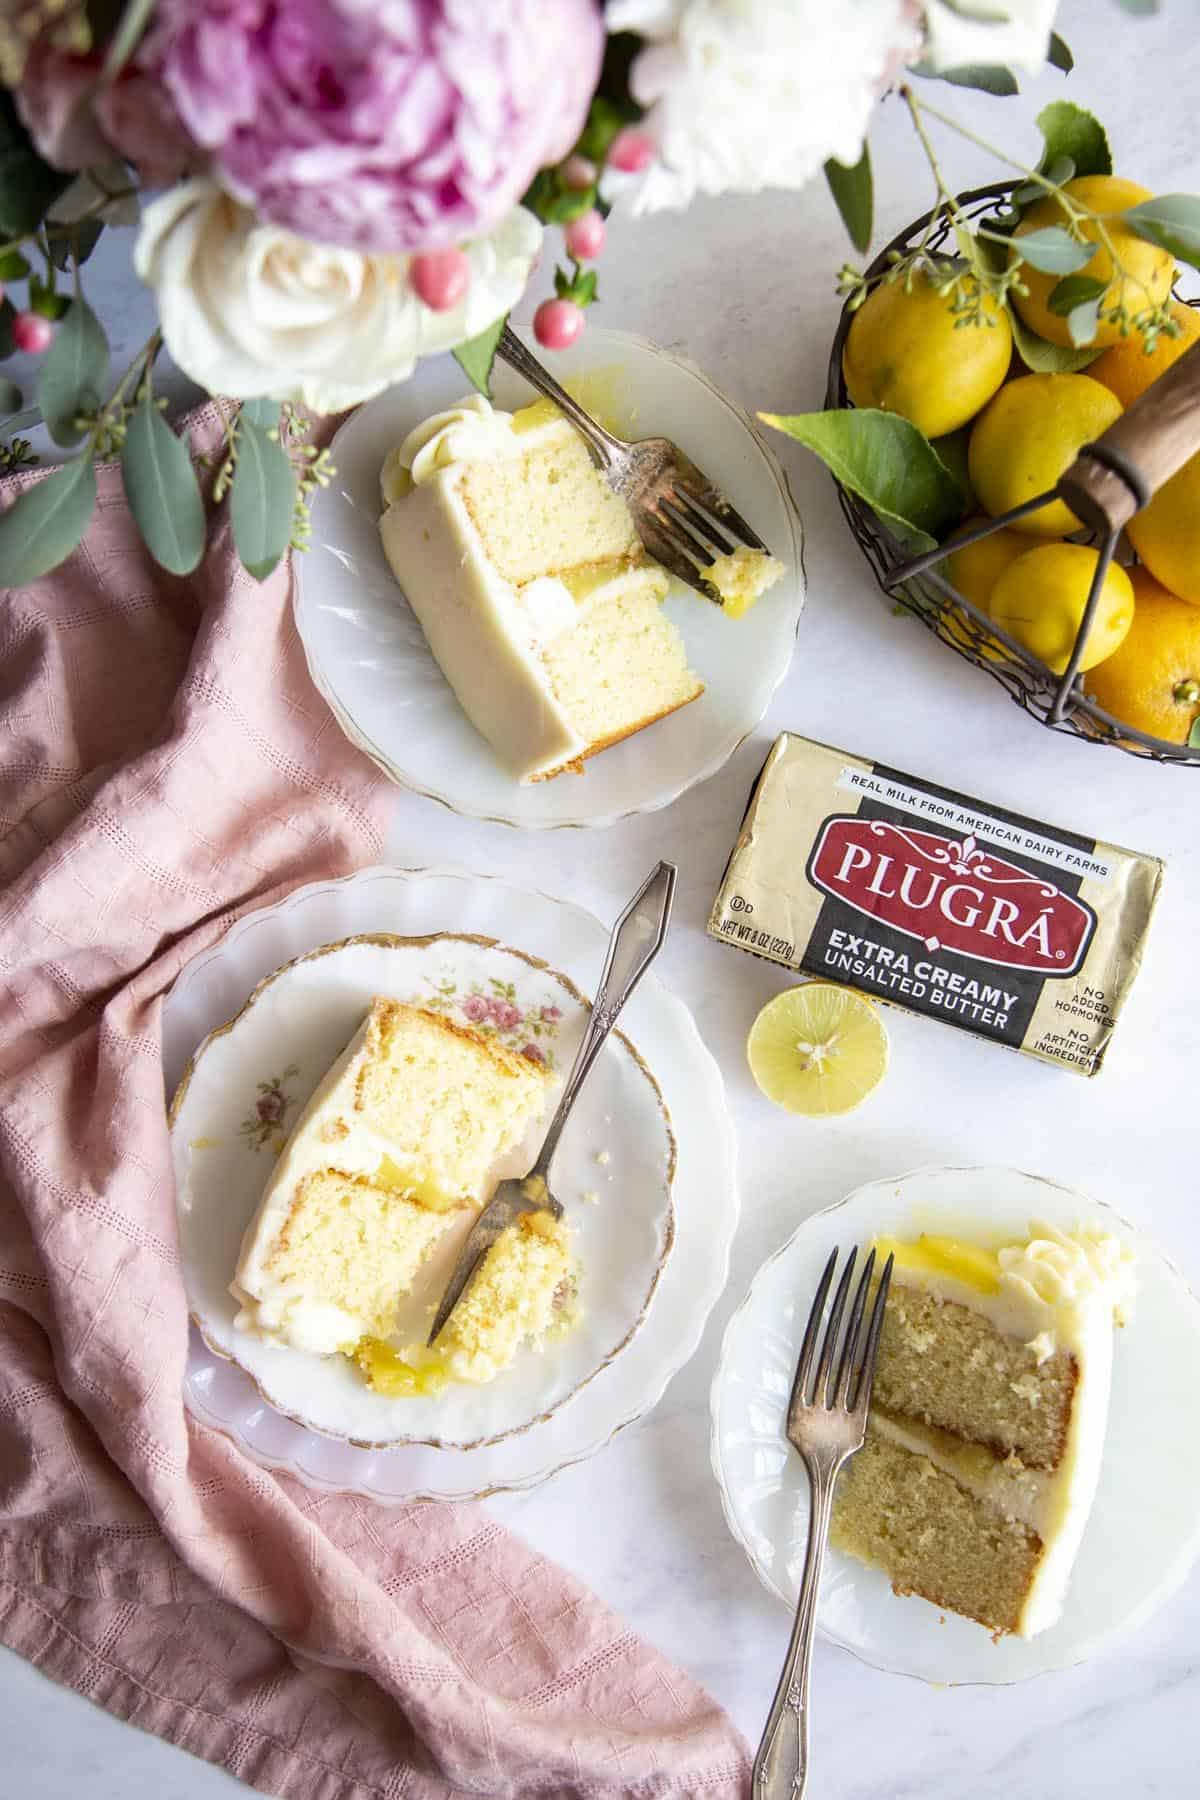 3 slices of lemon cake on plates